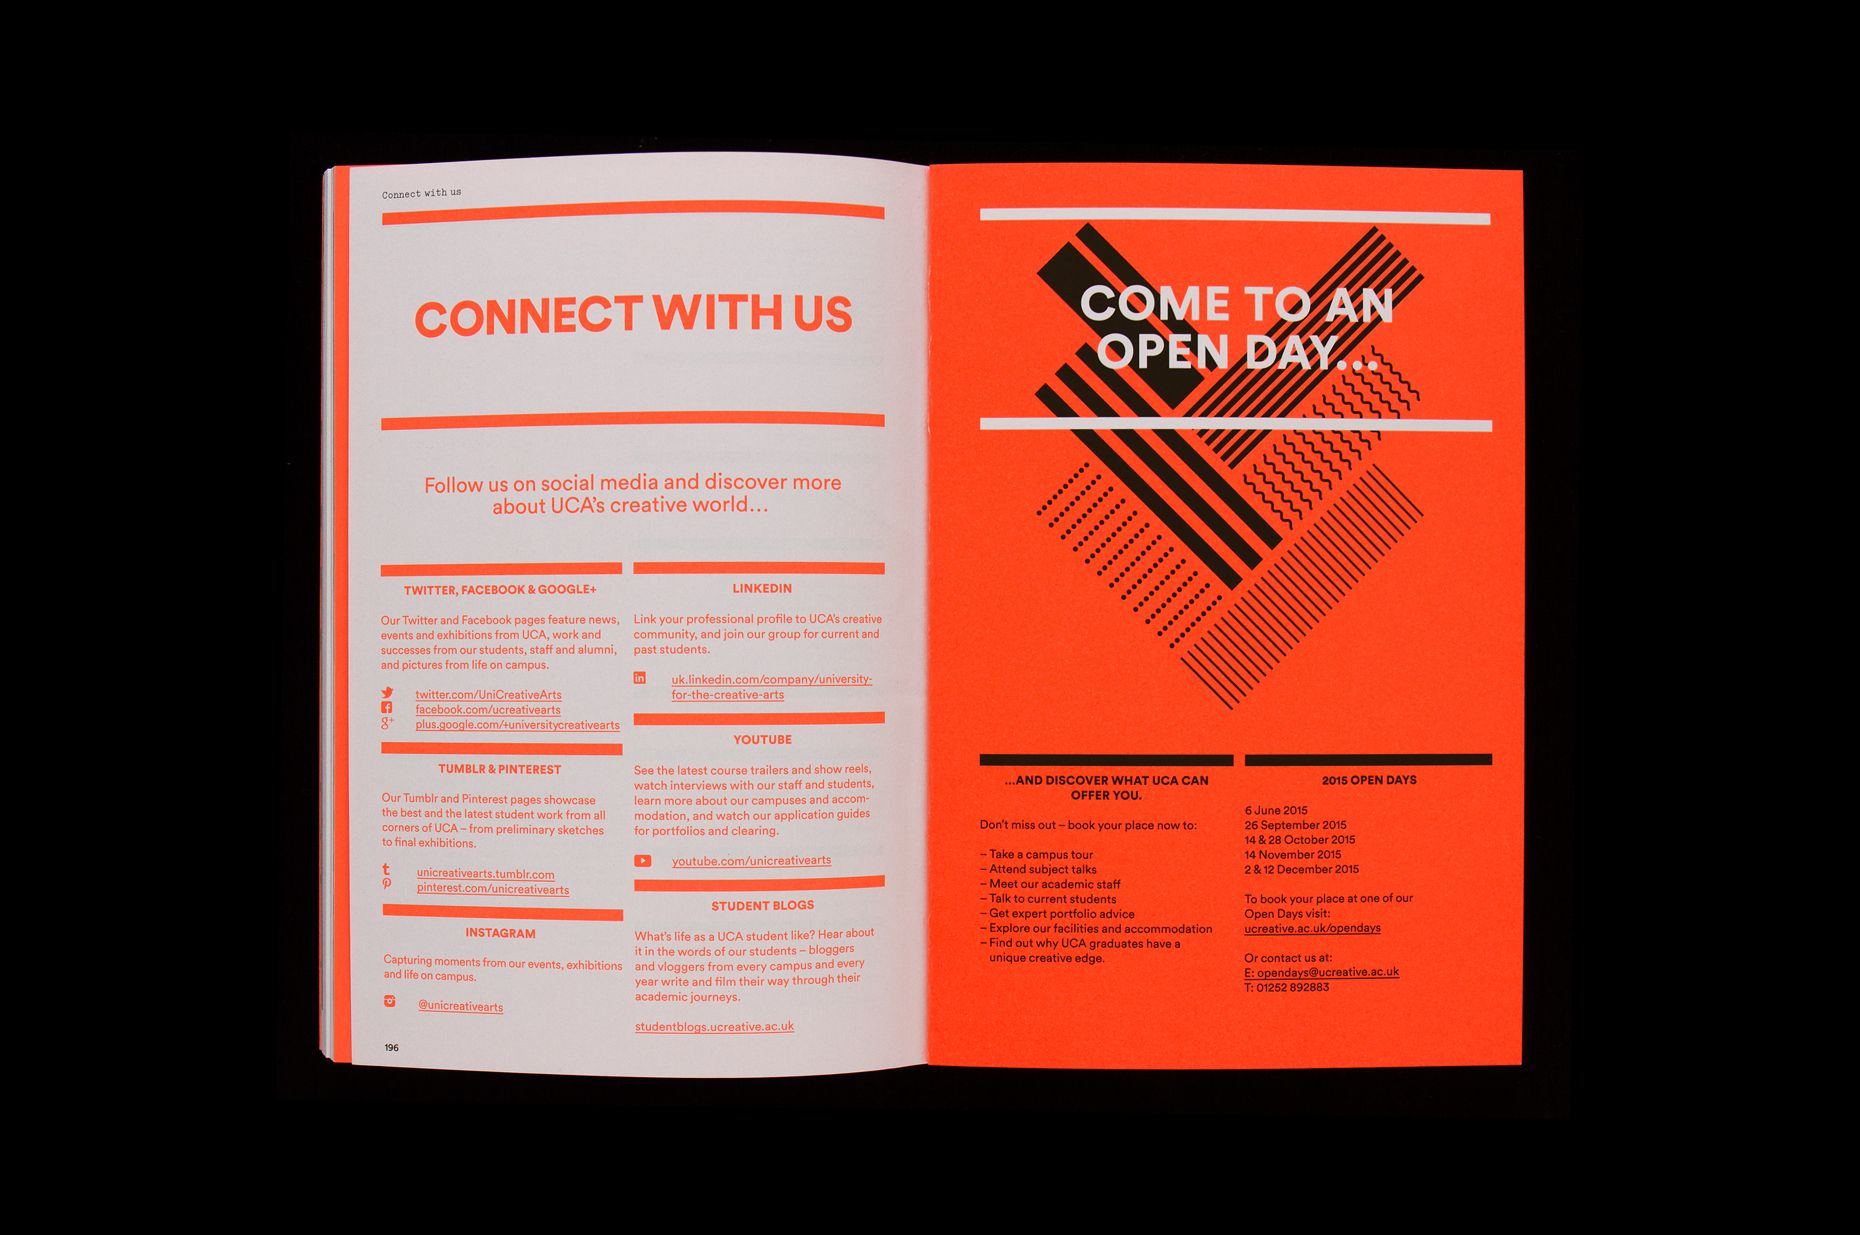 university for the creative arts visual identity inspirations rh pinterest co uk